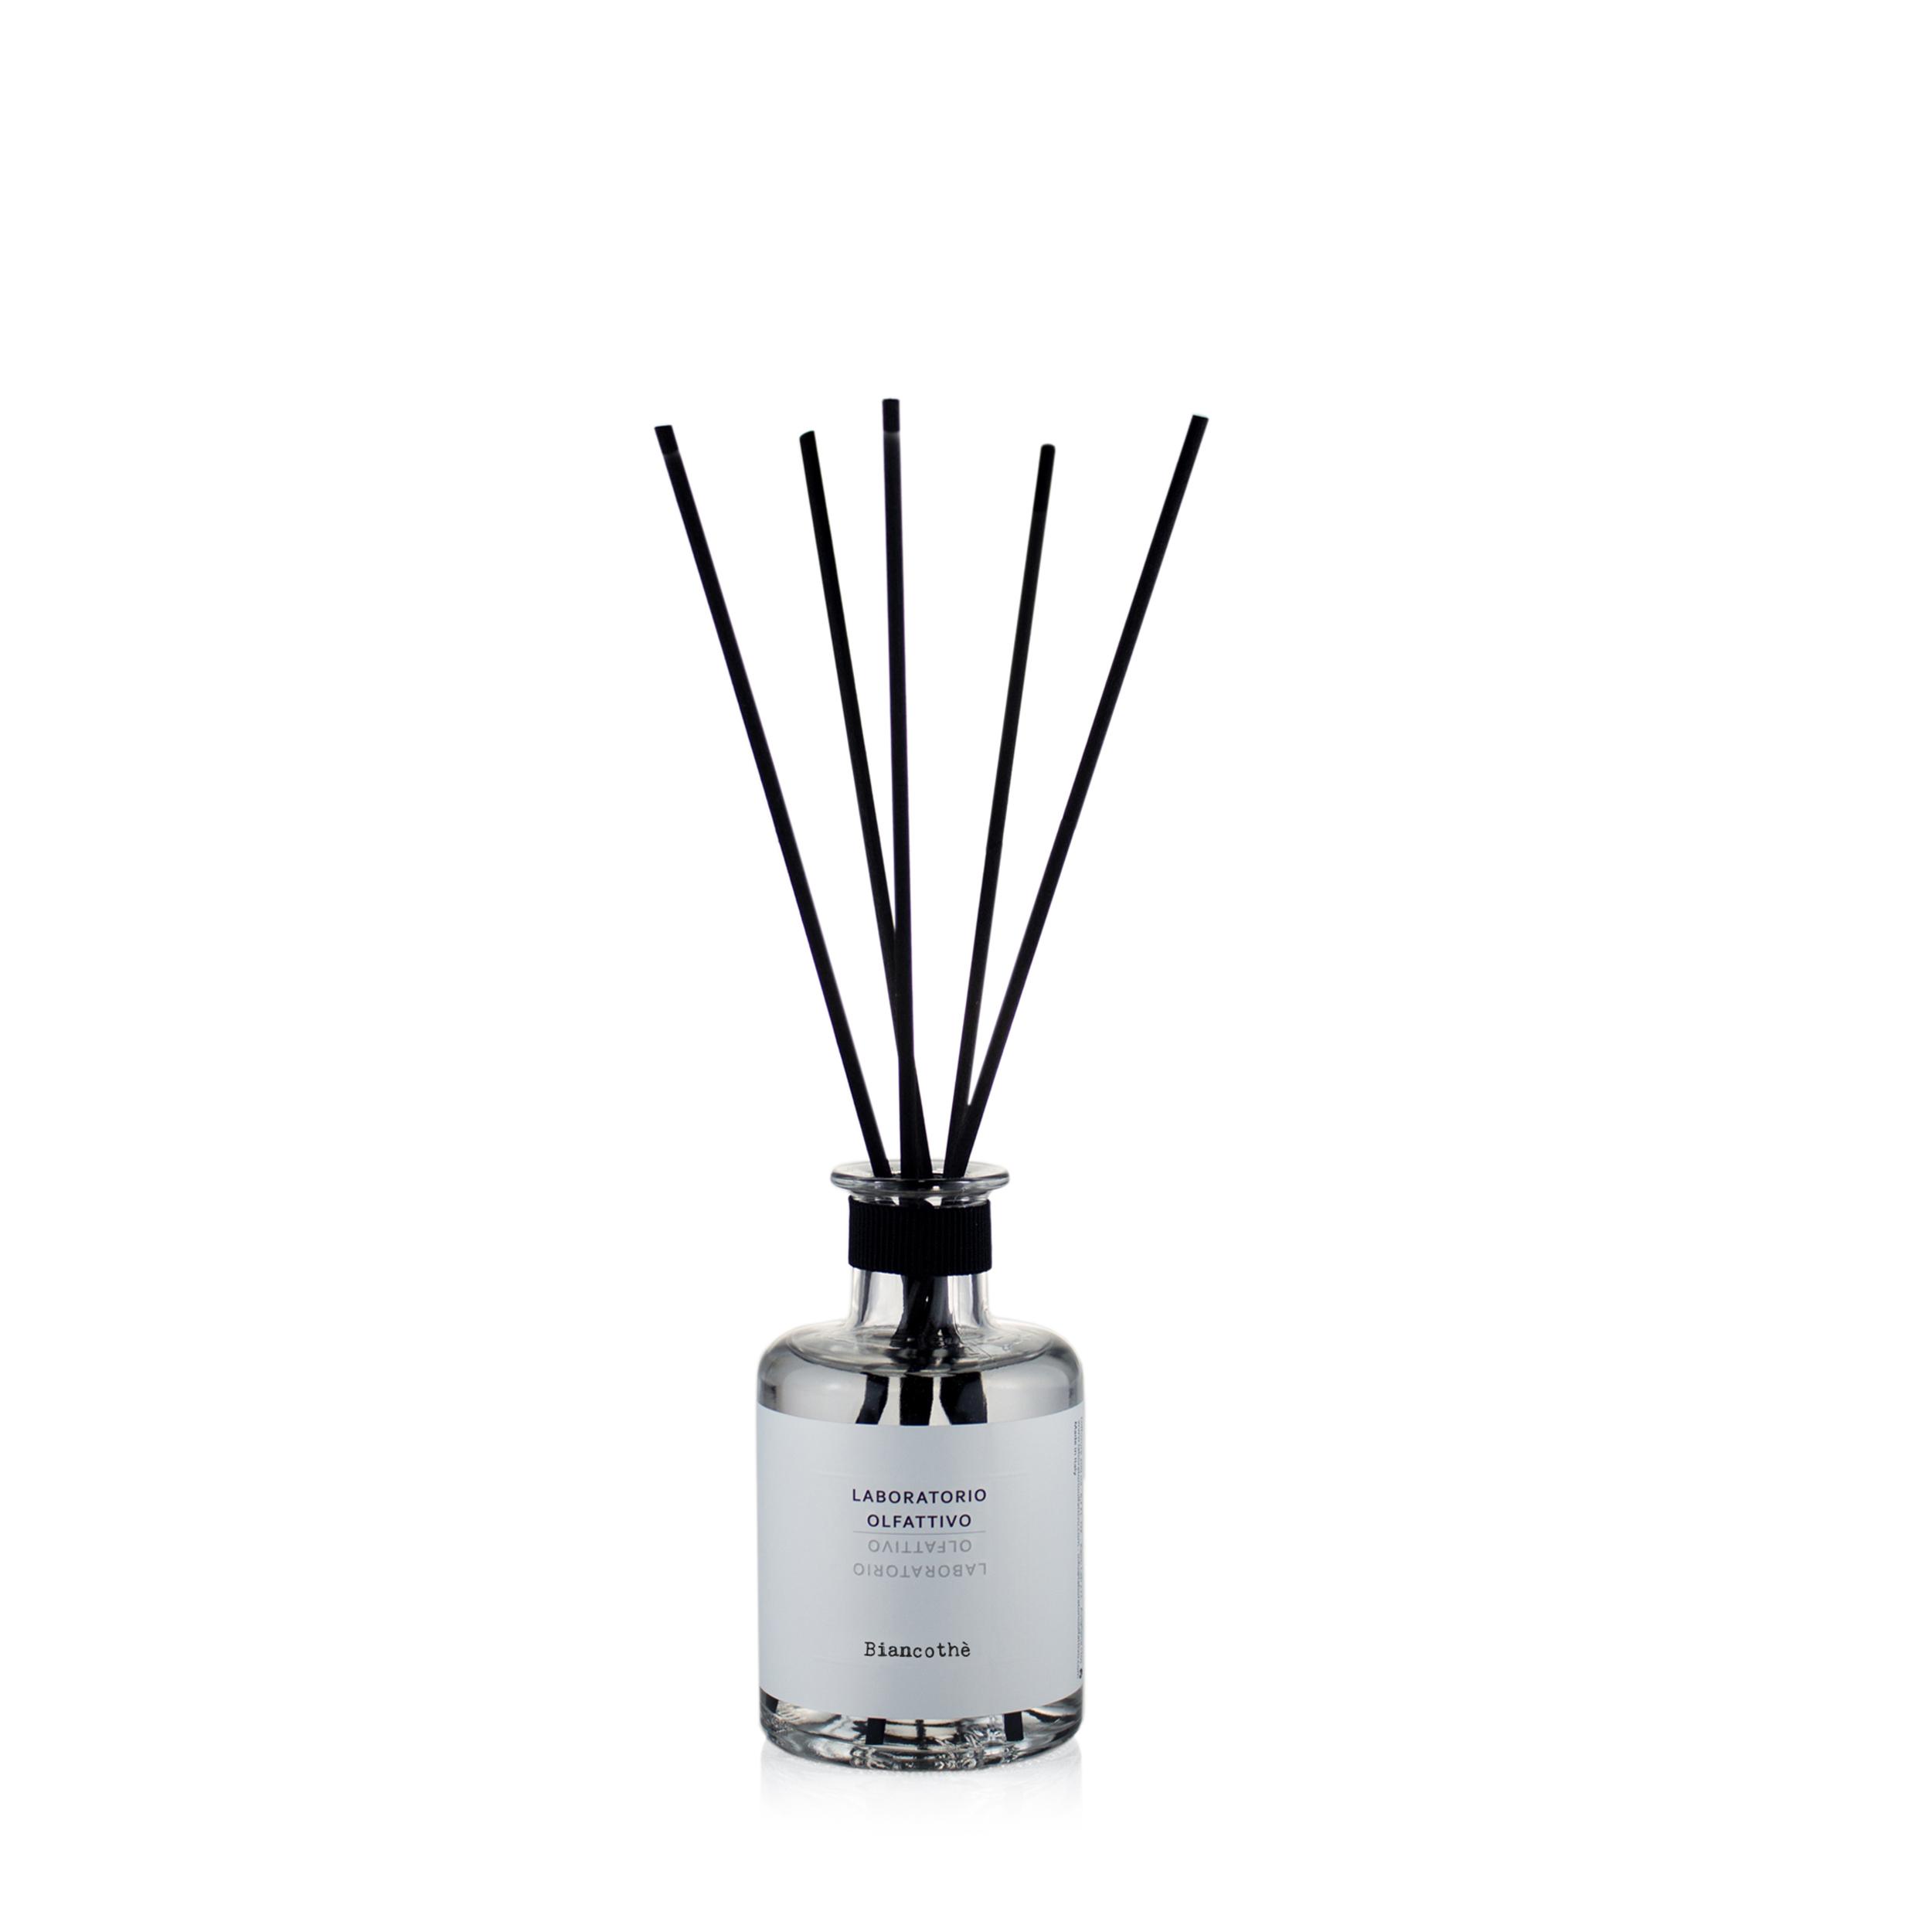 Купить Laboratorio Olfattivo Ароматический диффузор с палочками «Biancothe»